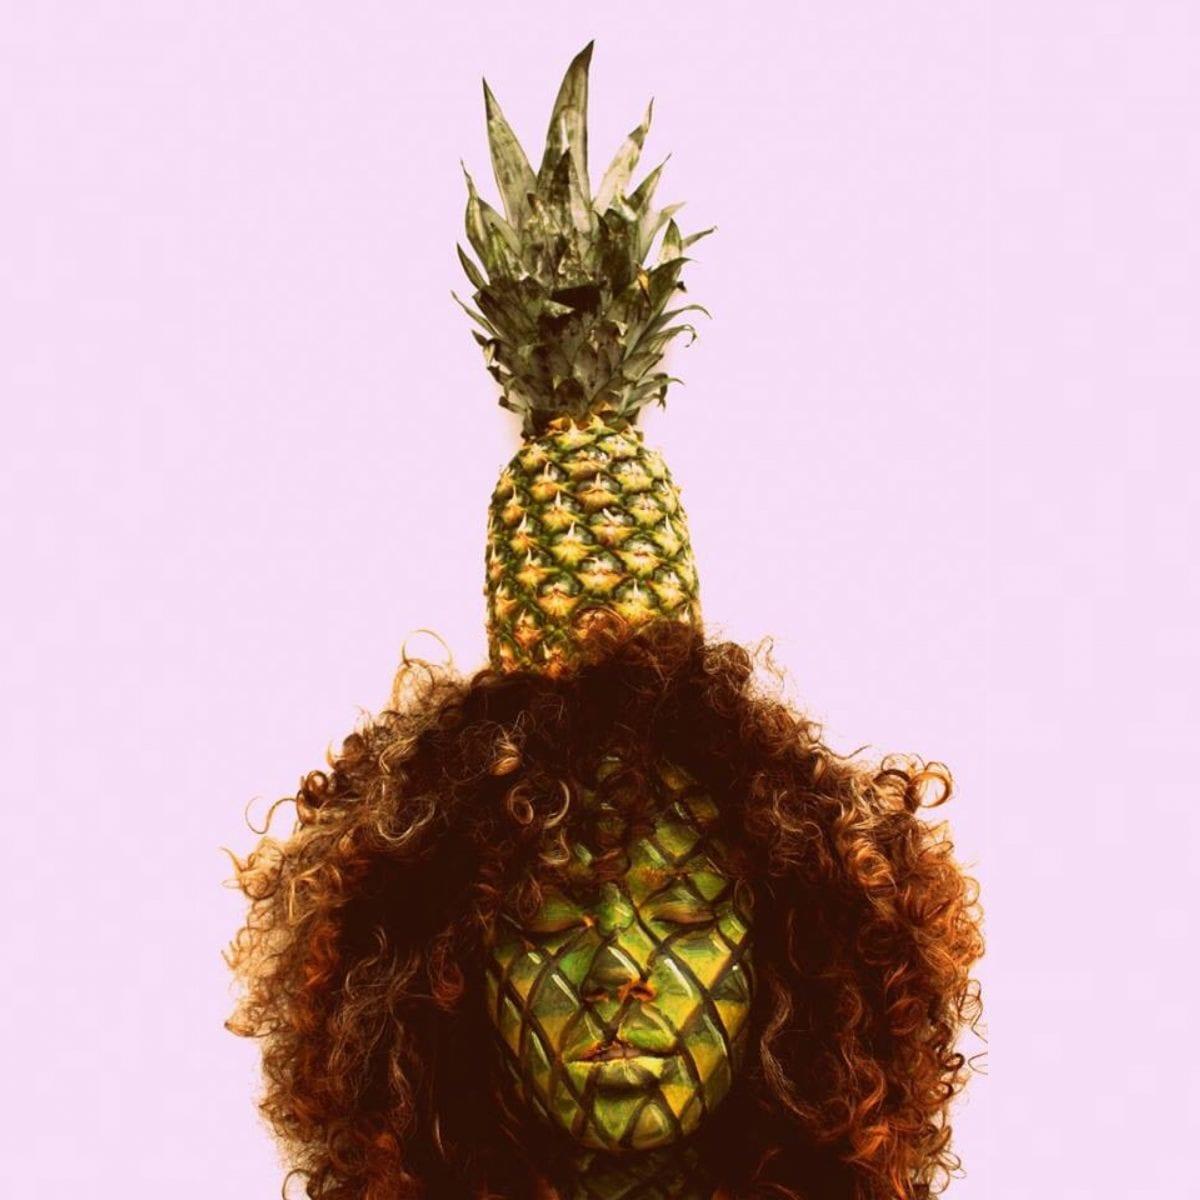 pineapple queen project